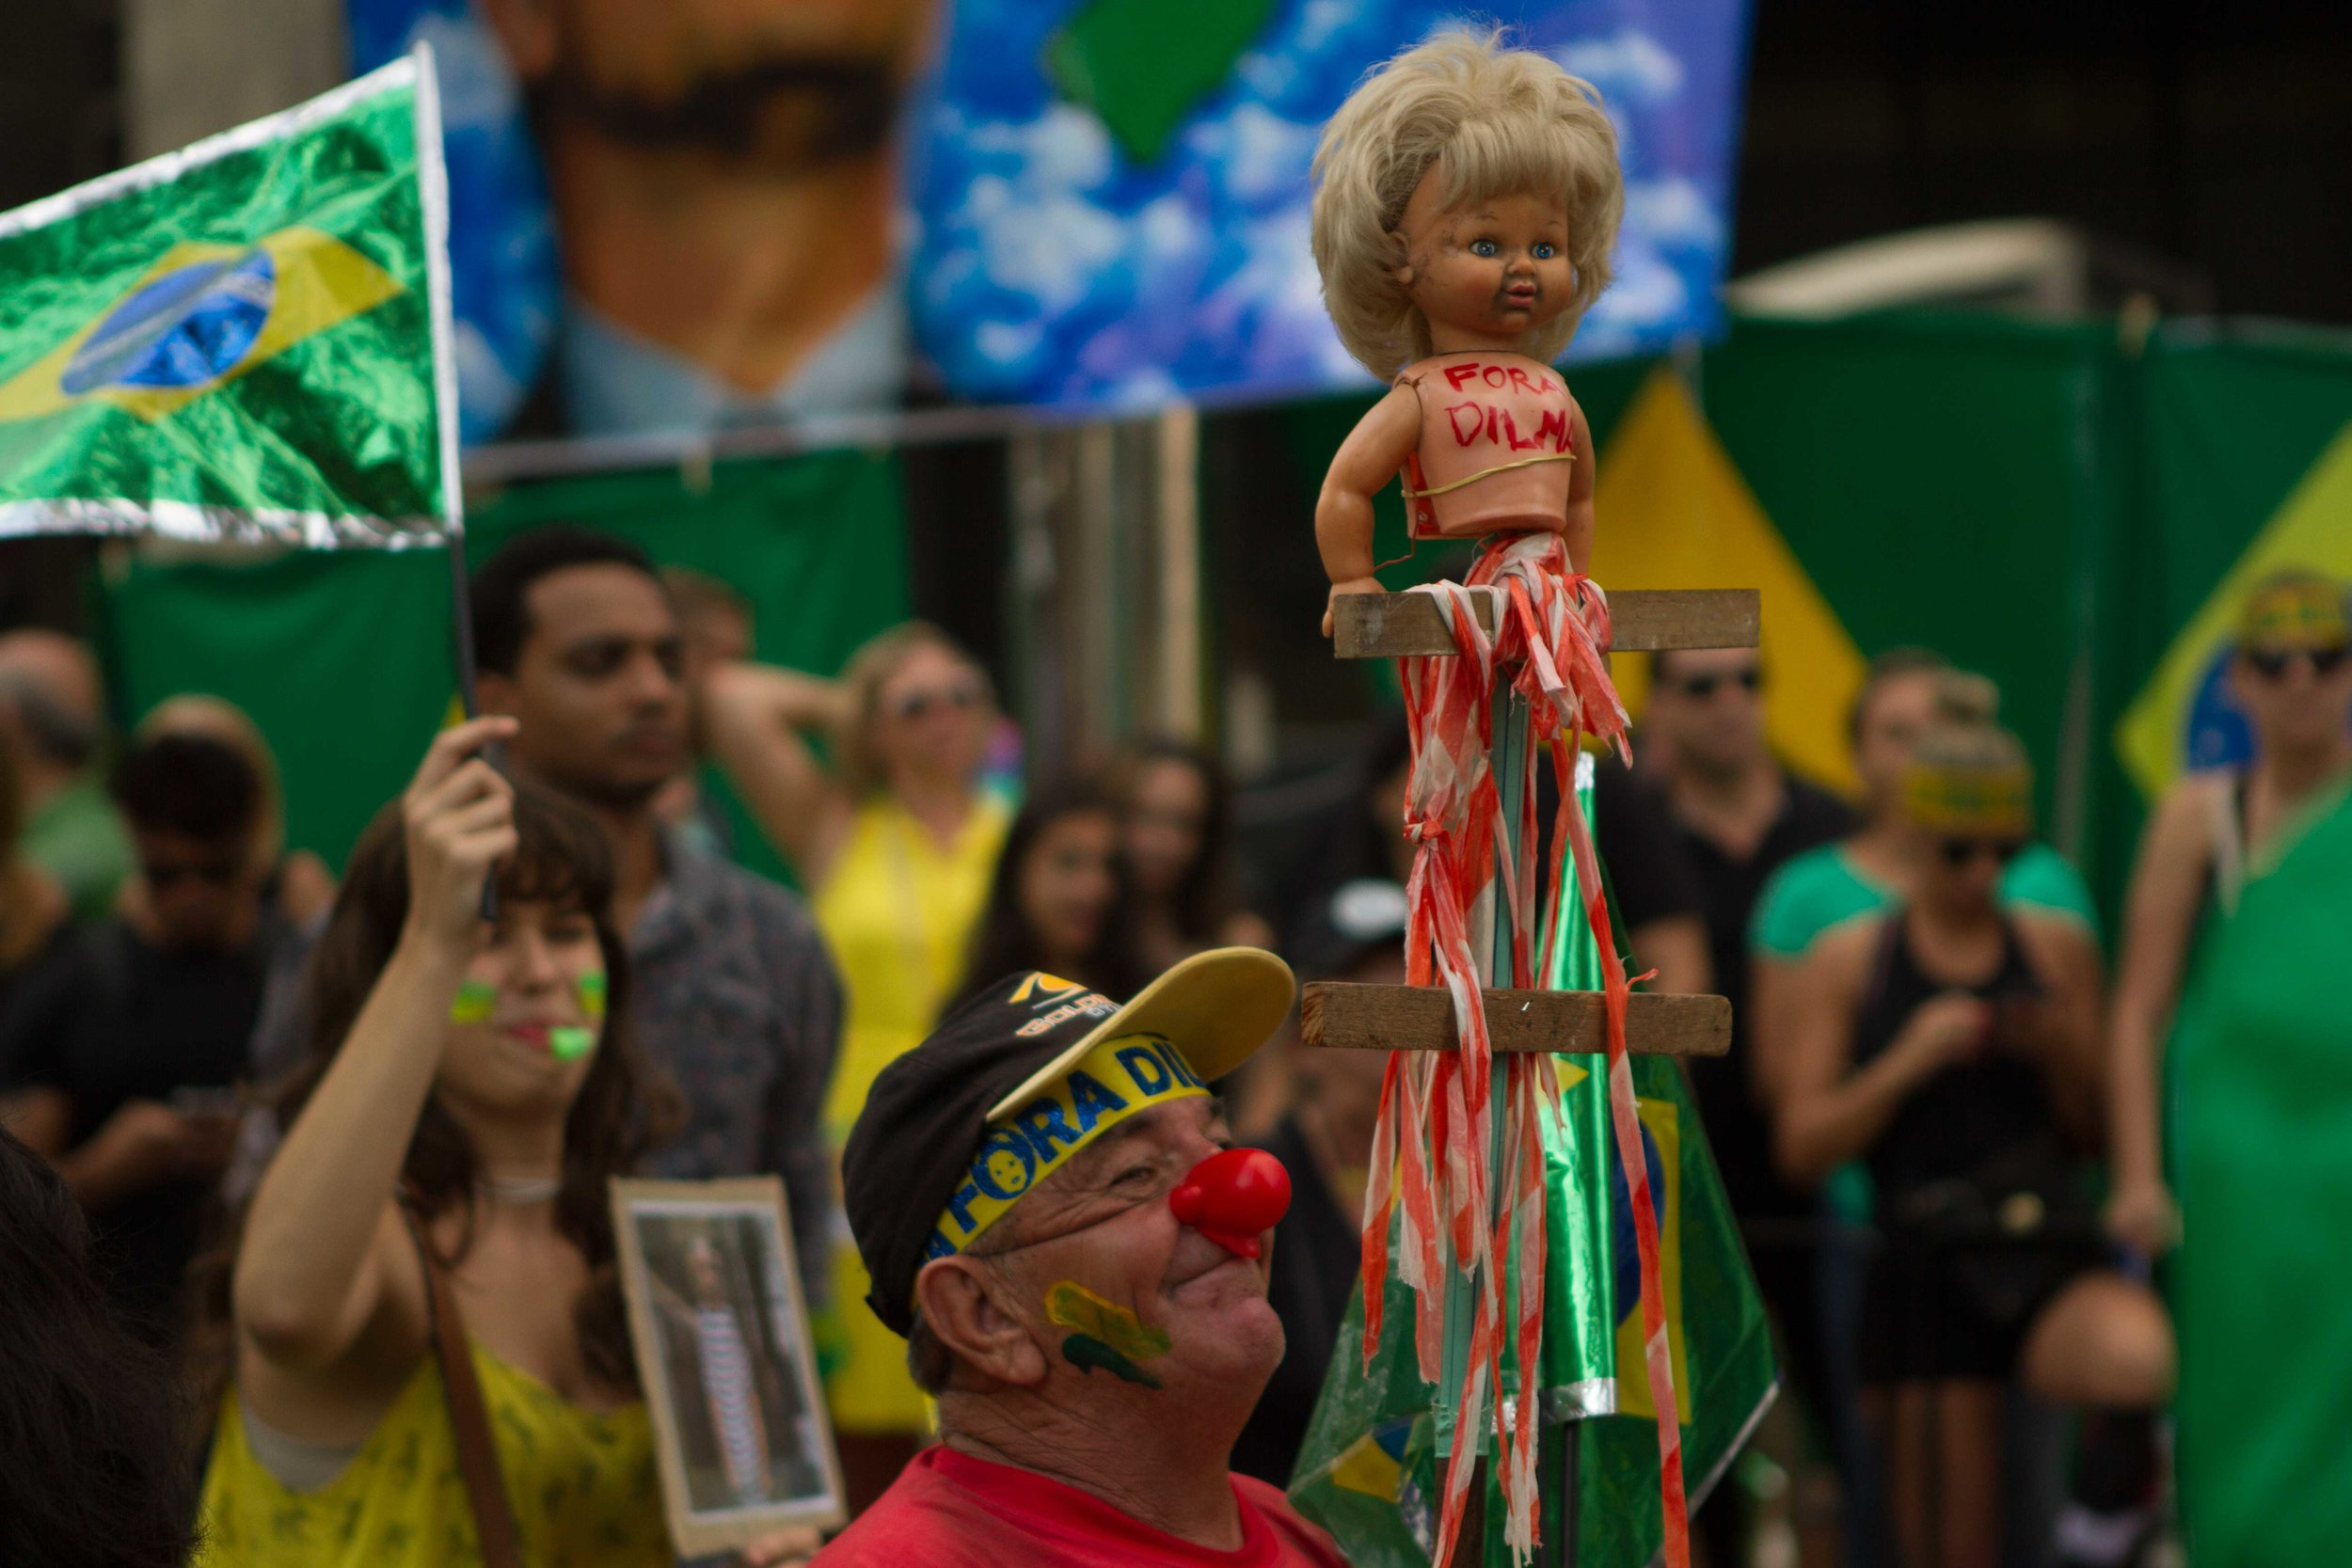 Sao-Paulo-protests-Huck-20.jpg